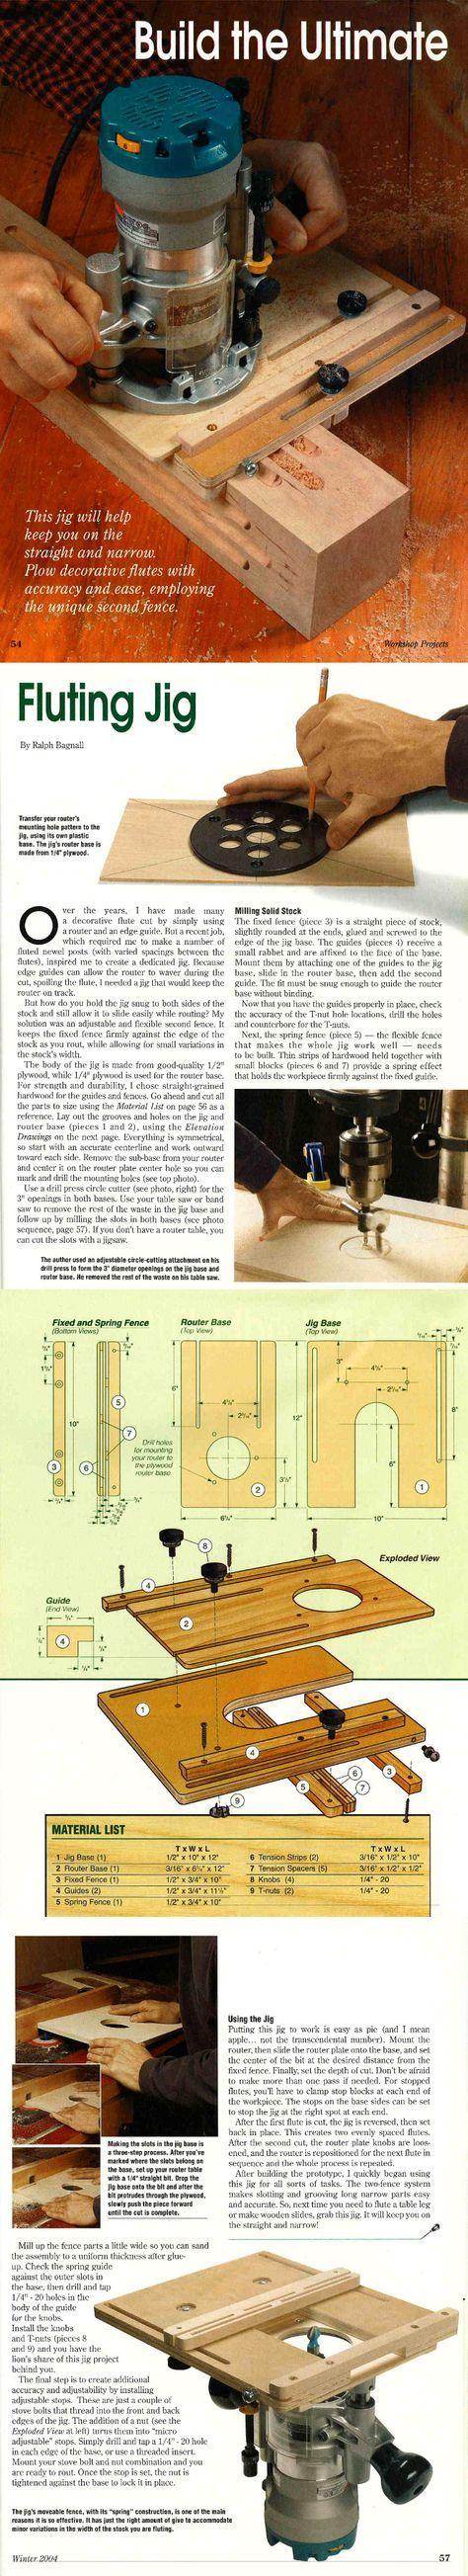 fr sschablone para el taller pinterest woodworking woodwork and wood working. Black Bedroom Furniture Sets. Home Design Ideas